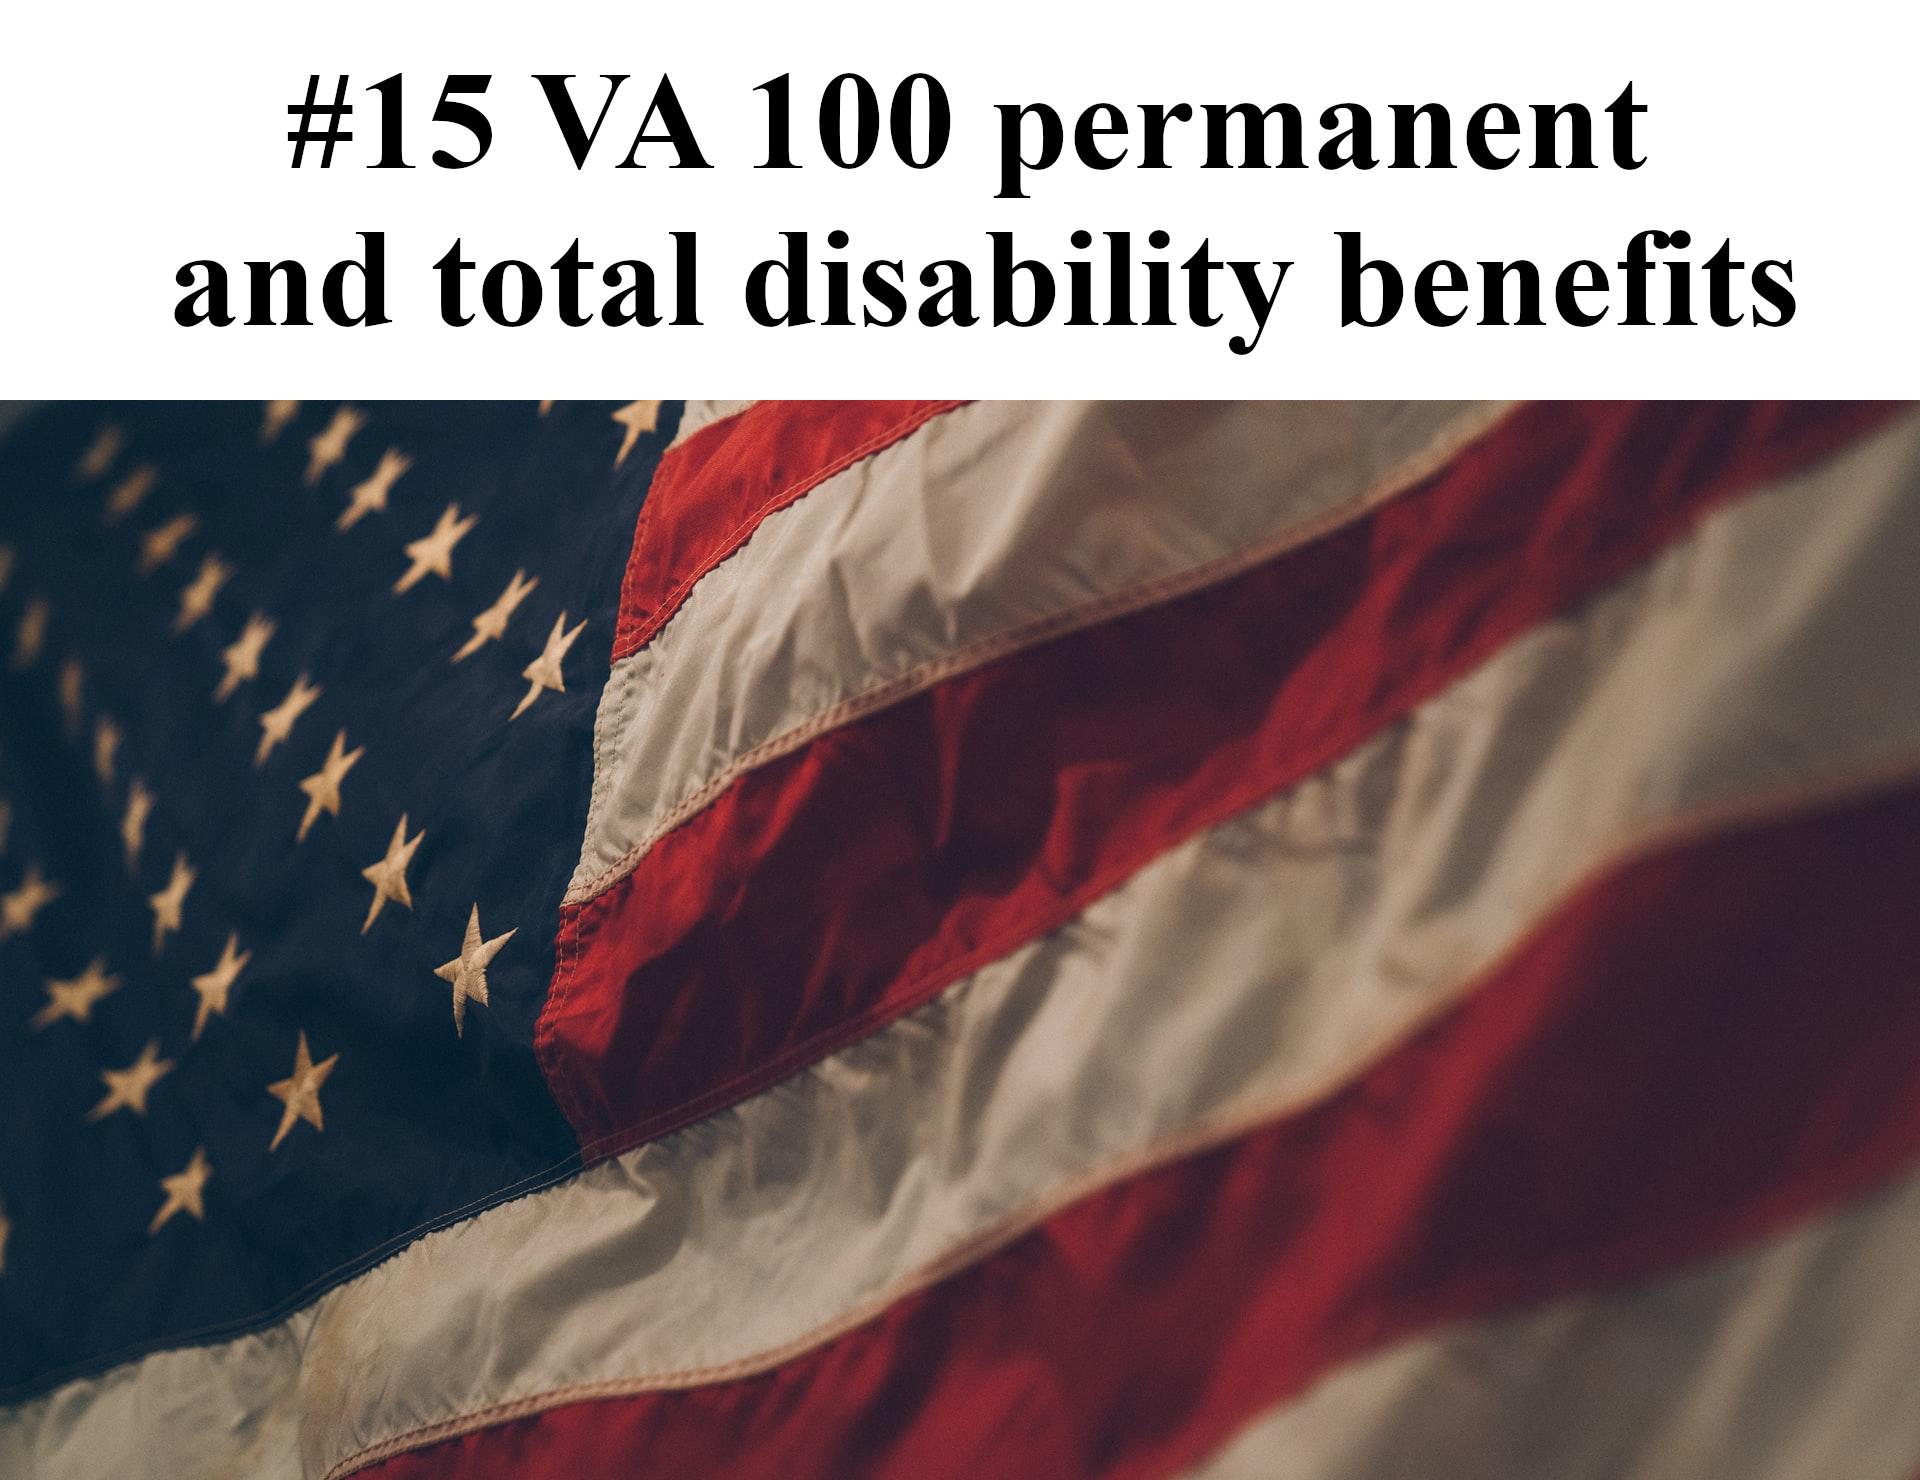 #15 VA 100 permanent and total disability benefits